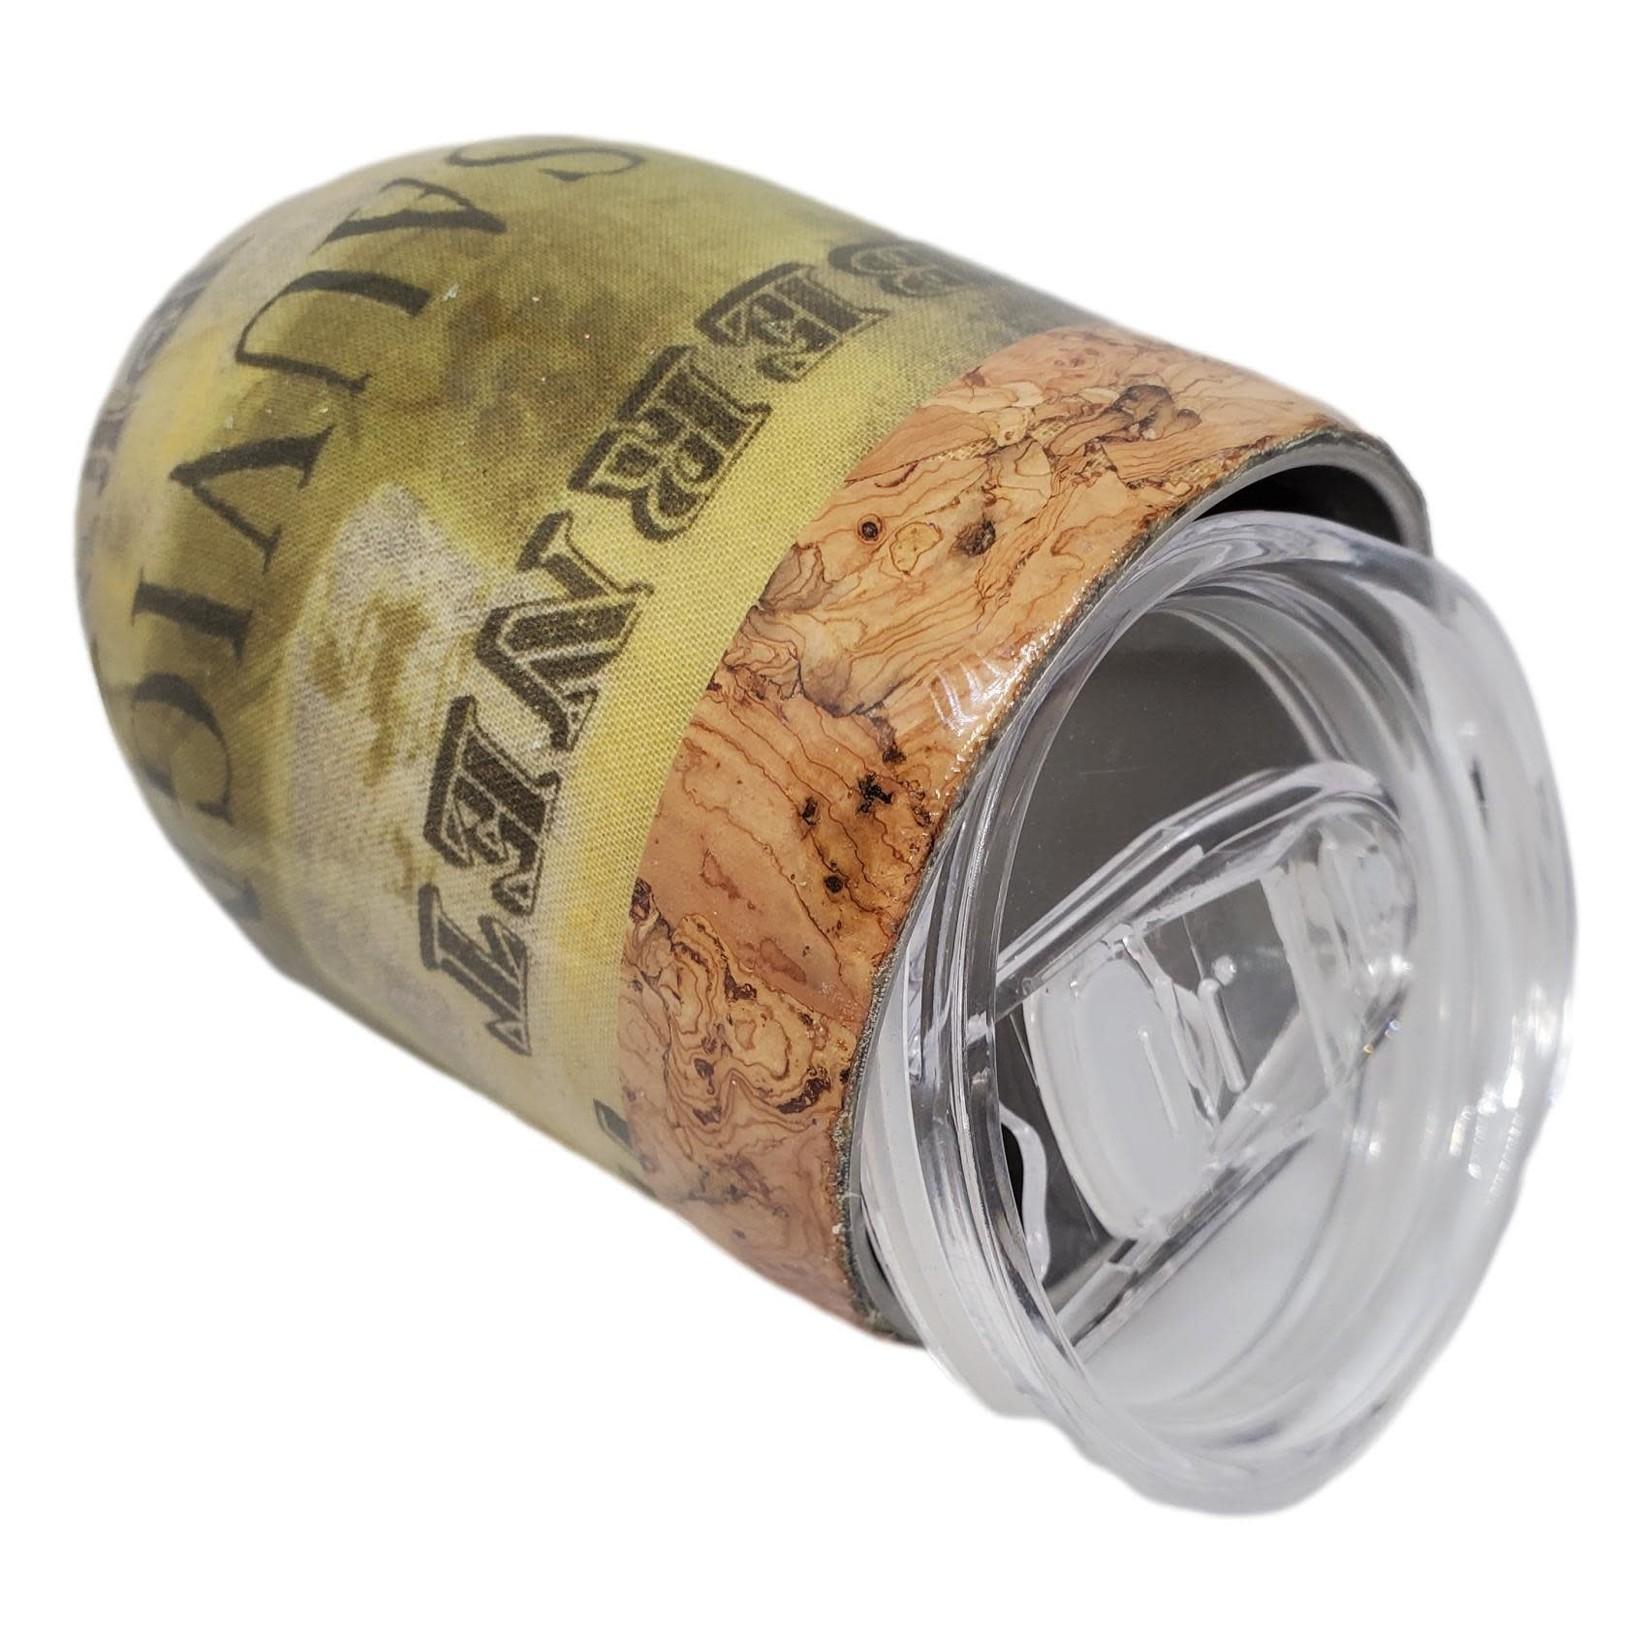 East Coast Sirens Cabernet Wine Tumbler